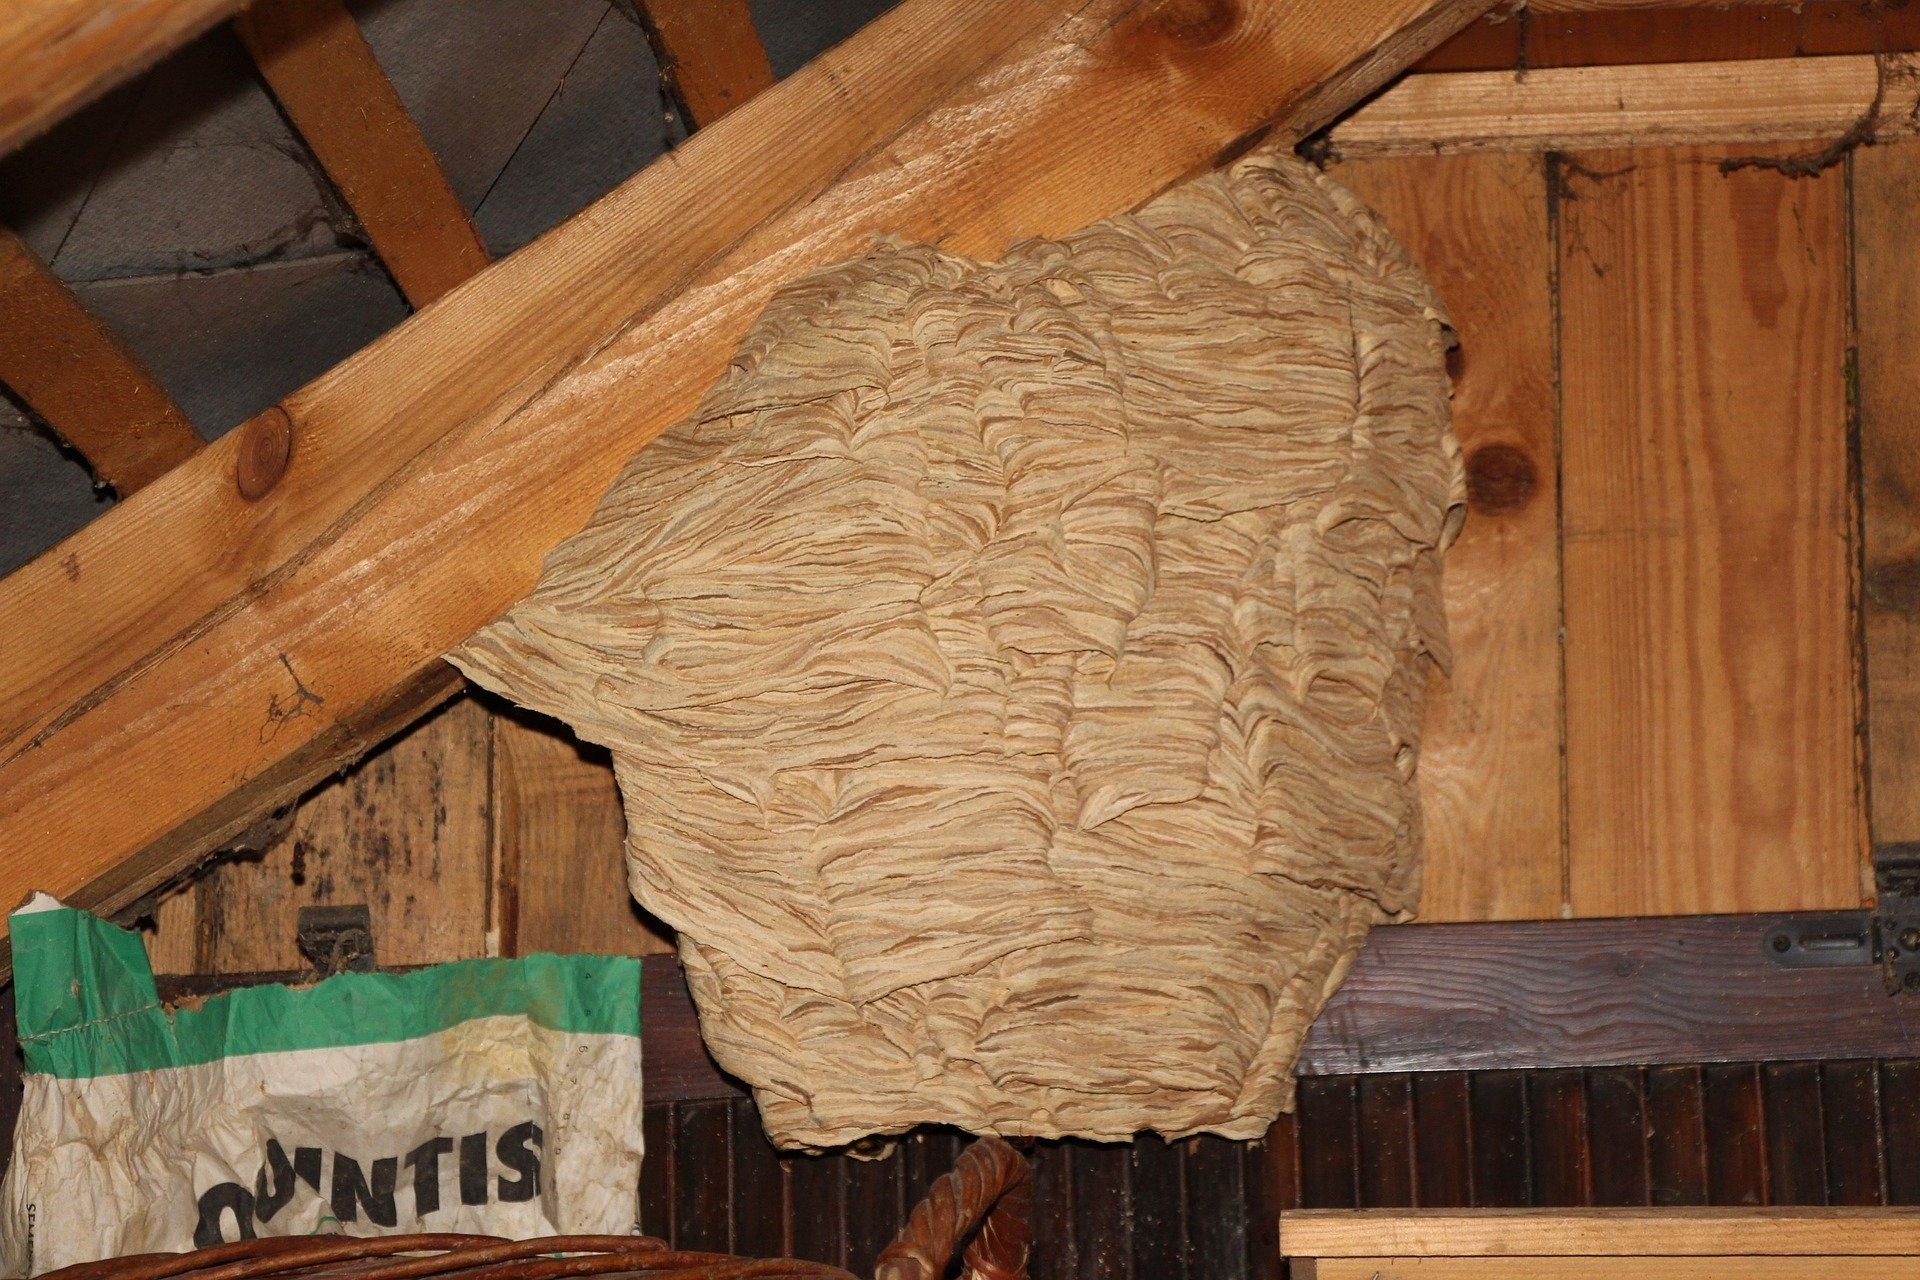 détruire nid de frelons neuilly plaisance